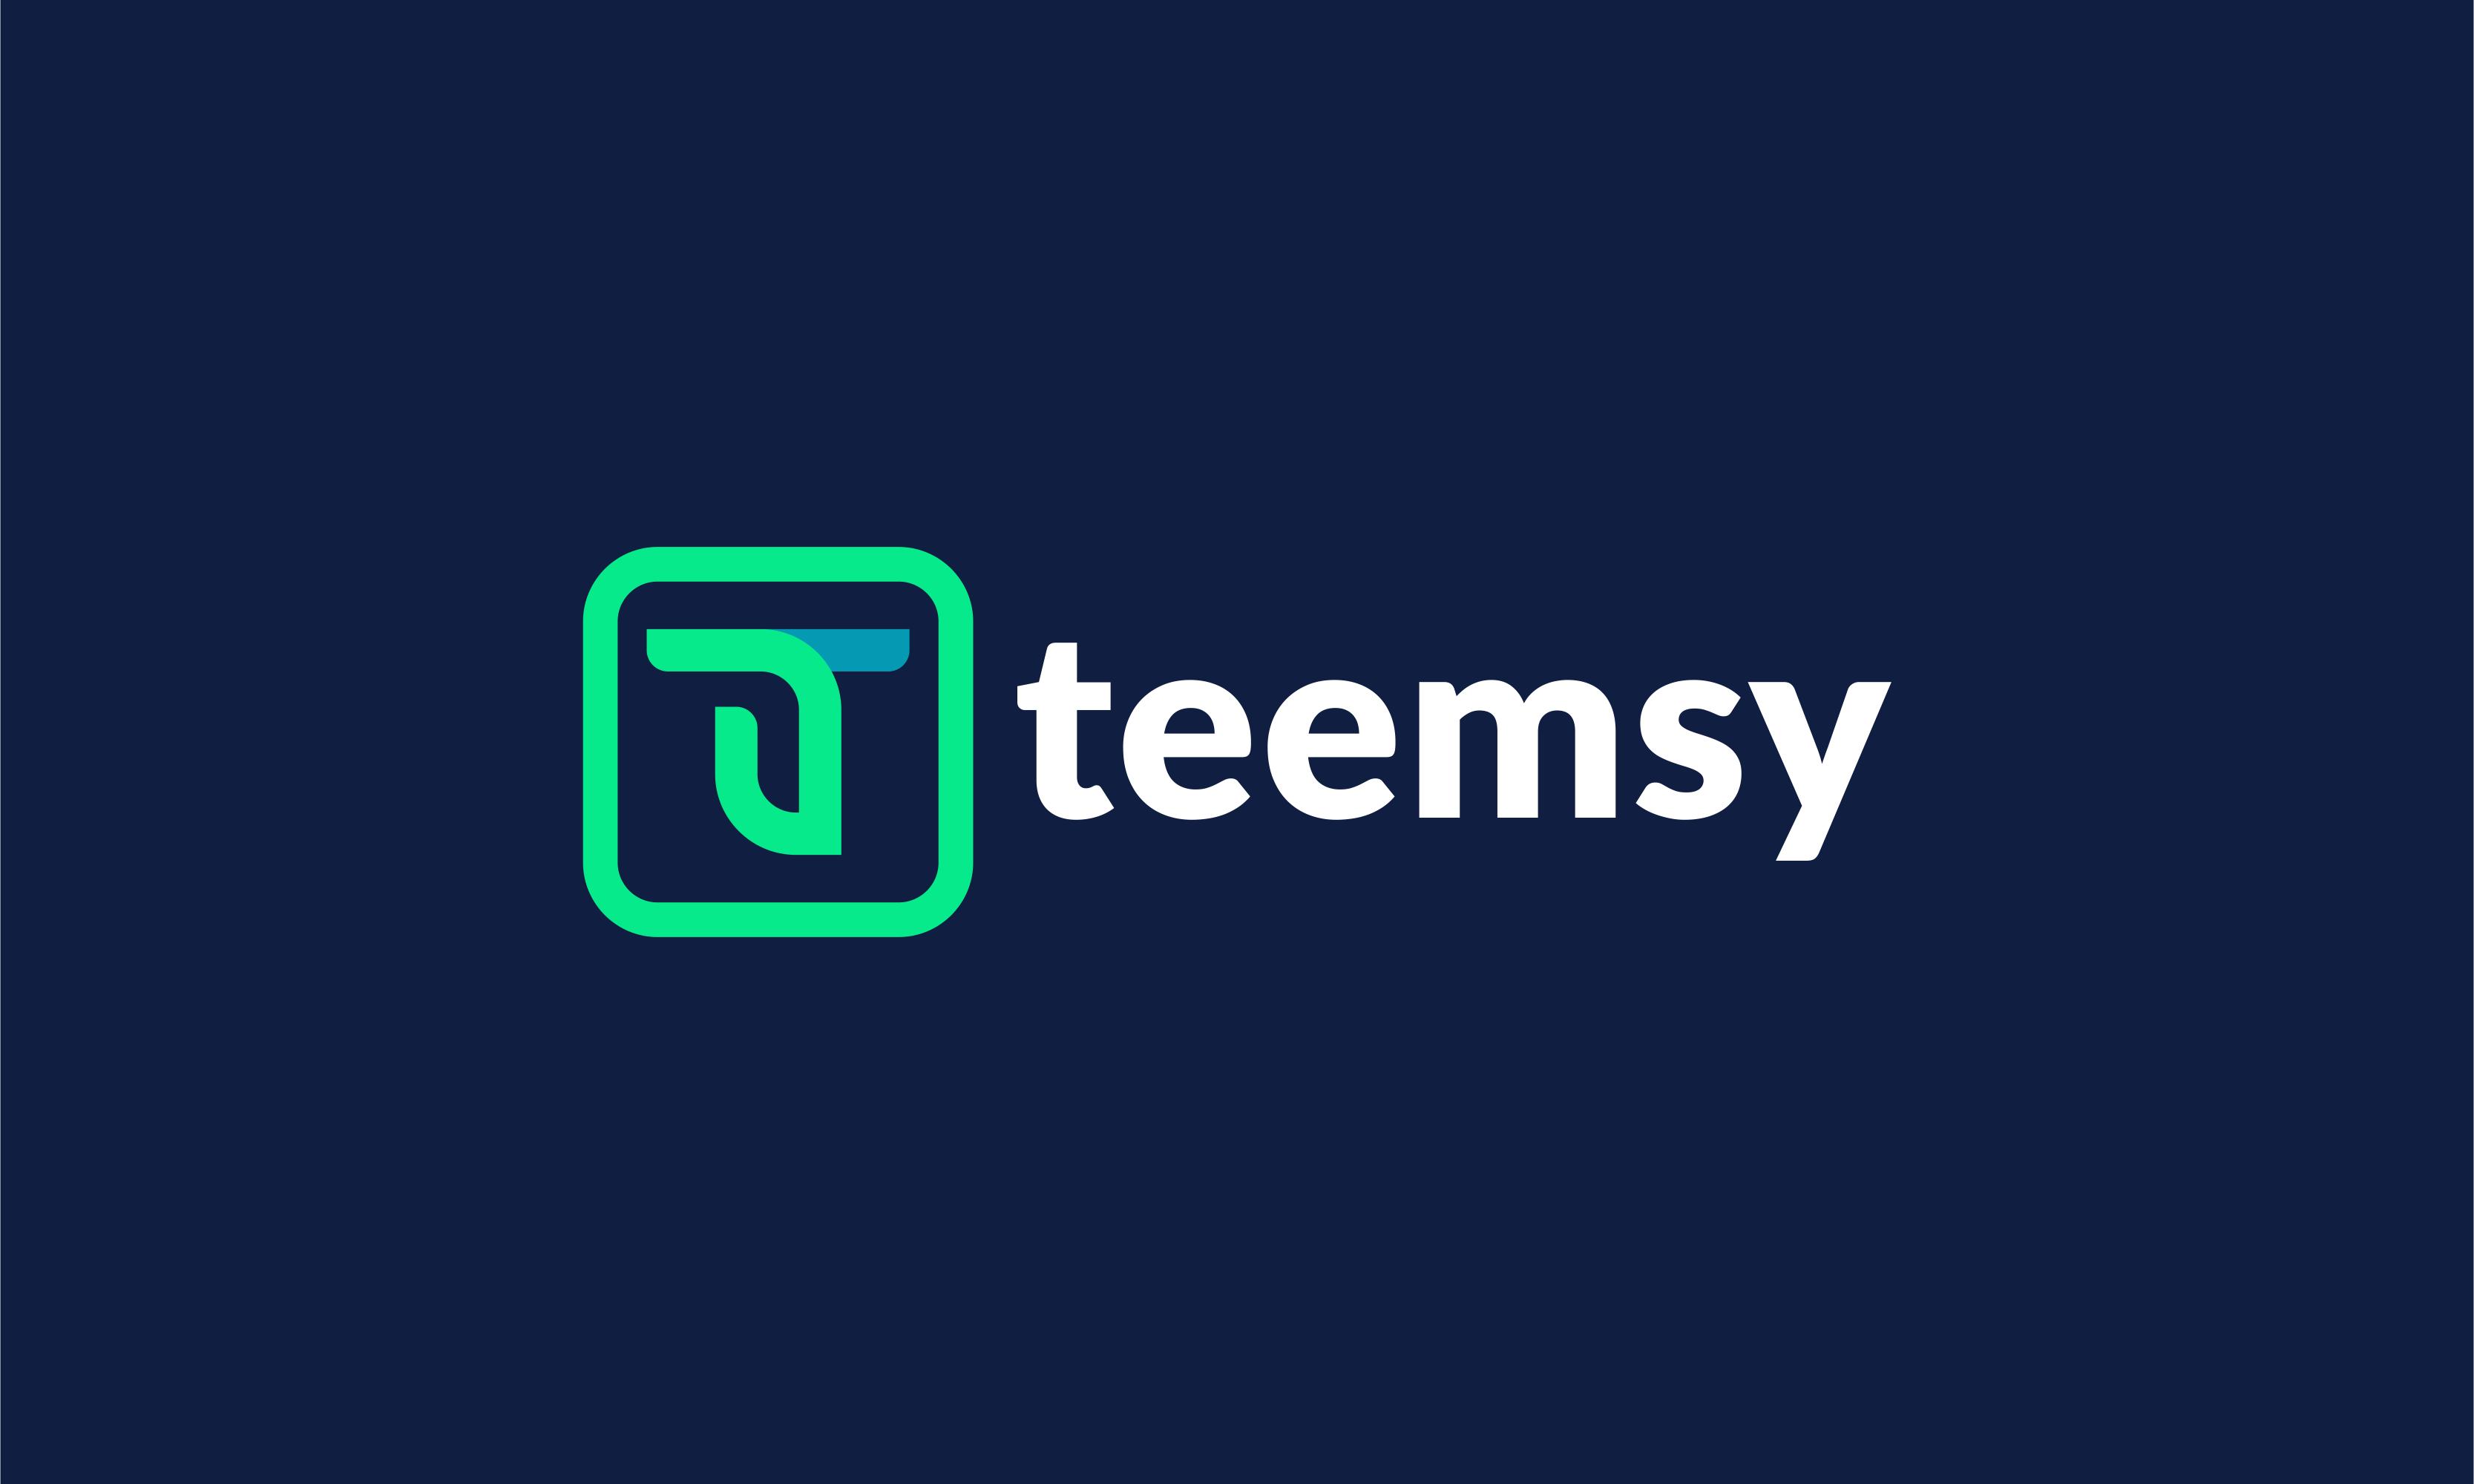 Teemsy